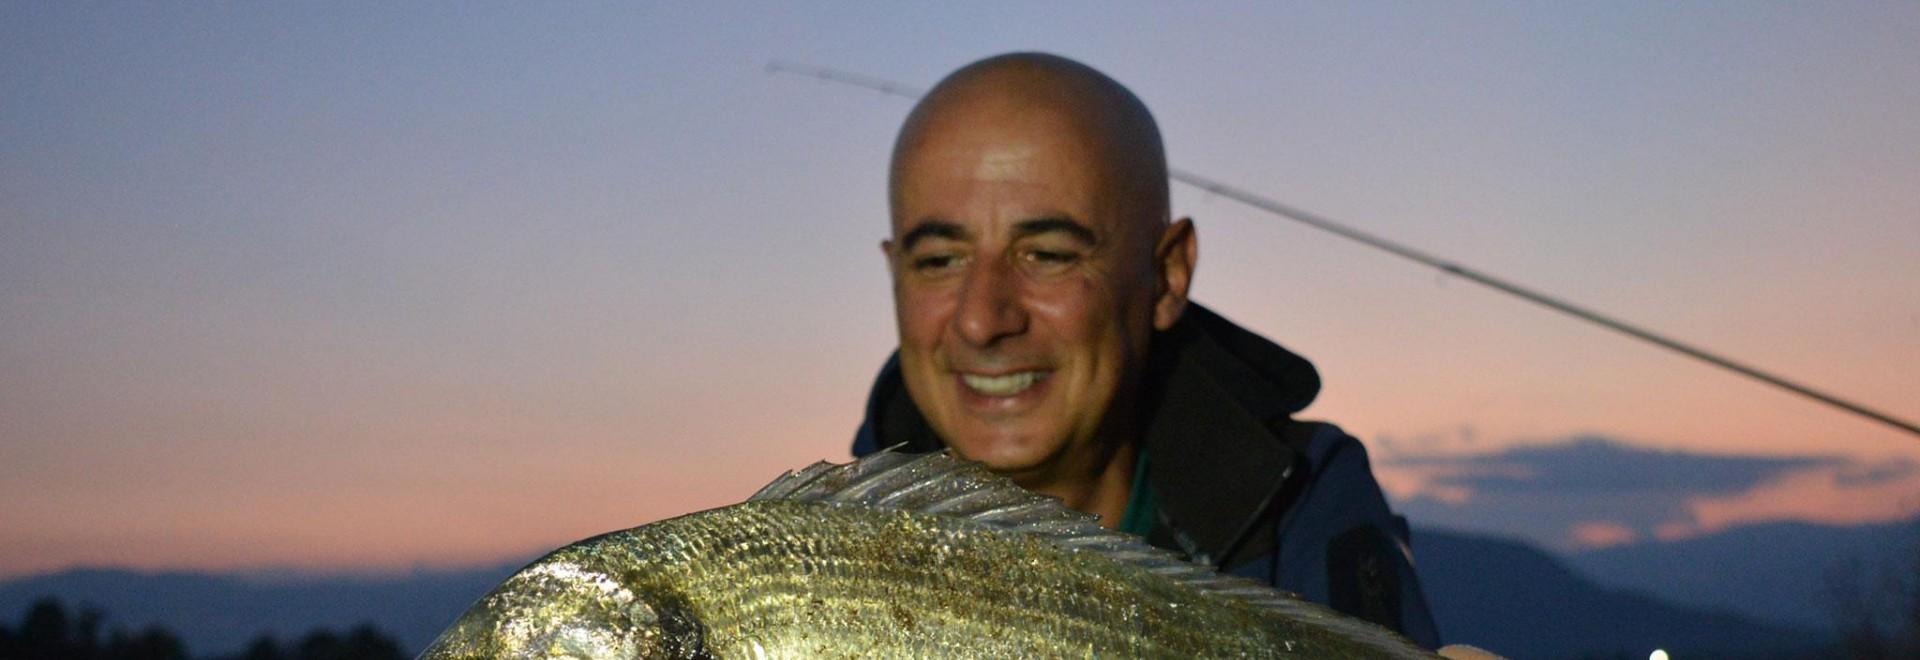 Reality Fishing Explorer